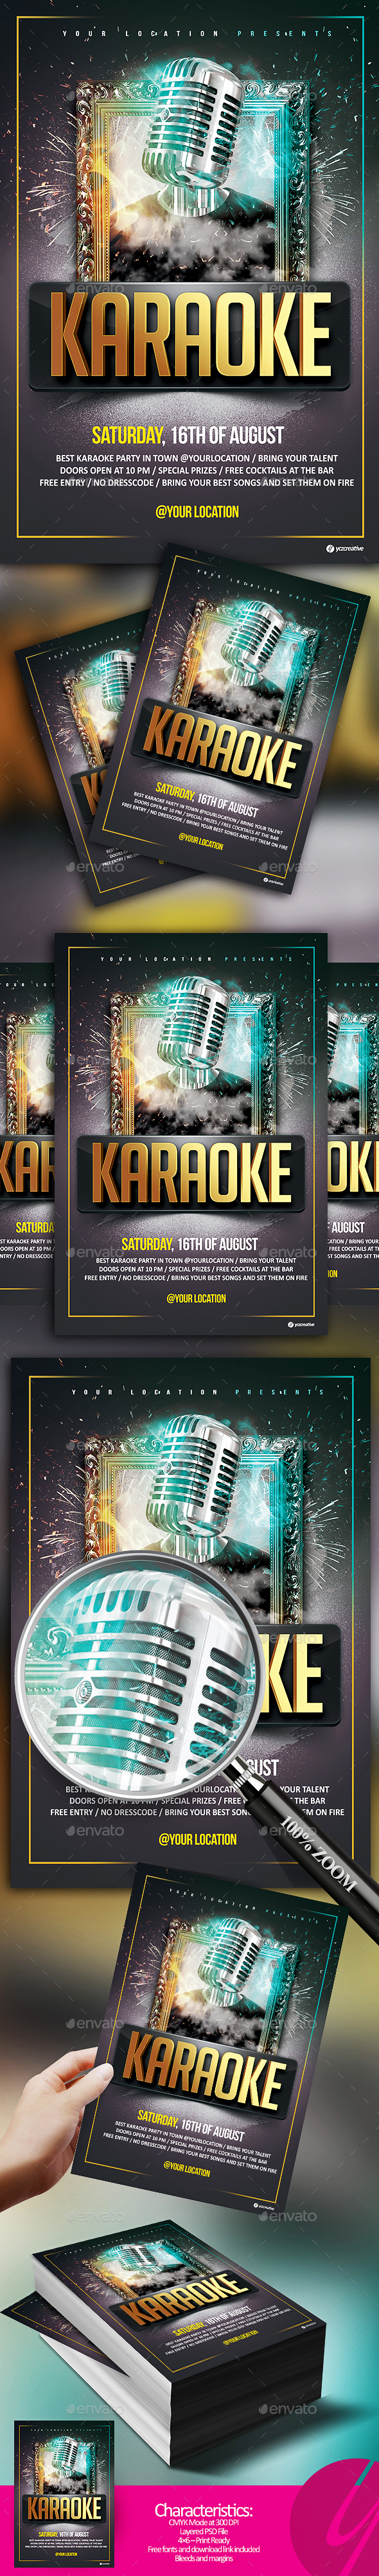 Karaoke Weekend Flyer - Clubs & Parties Events